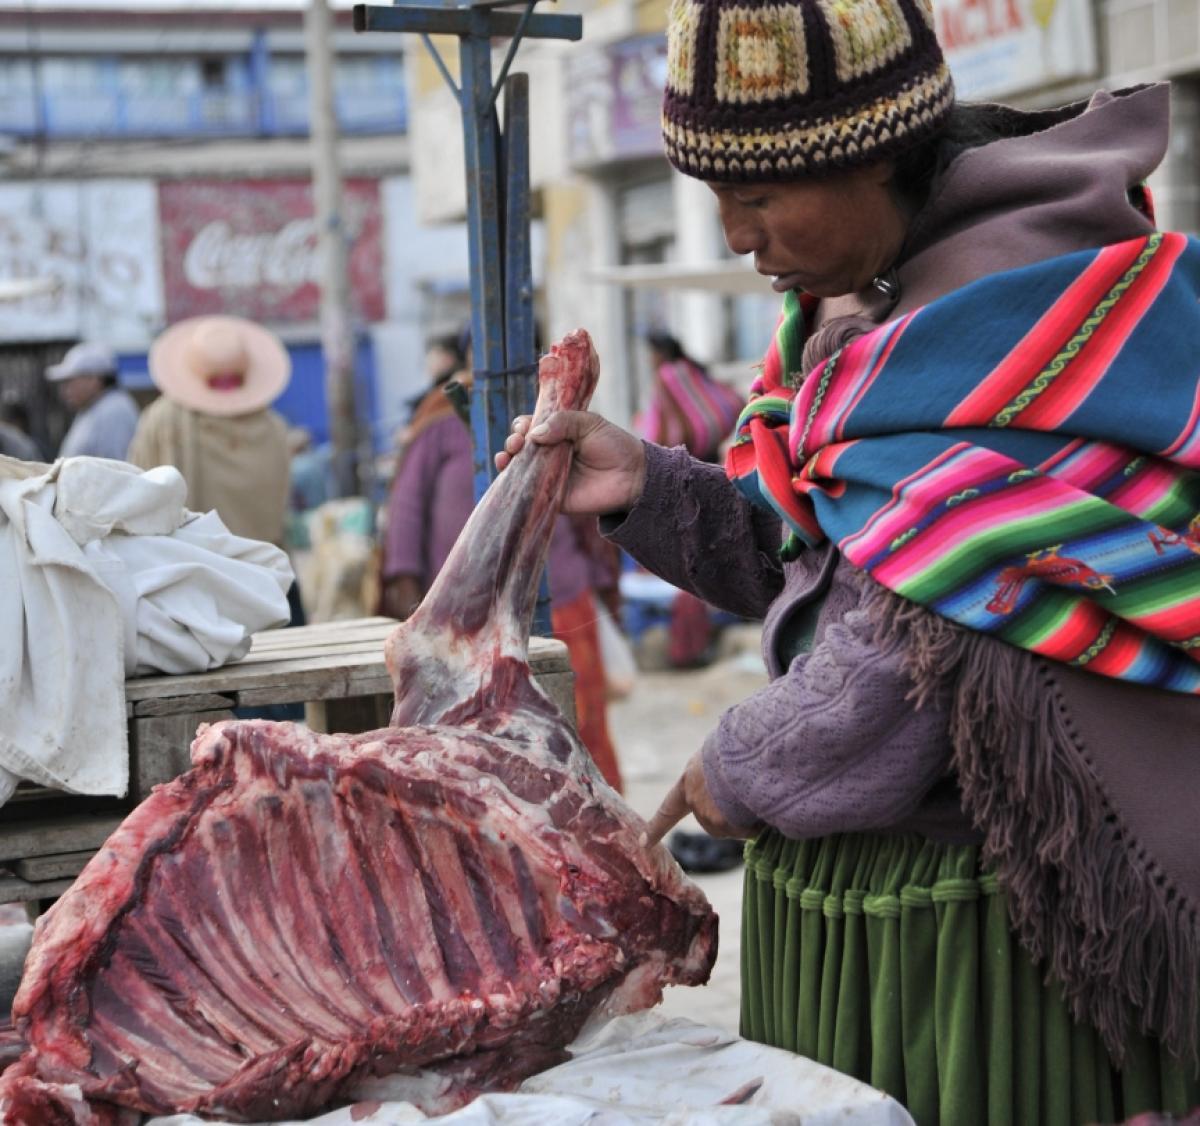 Bolivia touts llama as healthy alternative to beef - Star2.com